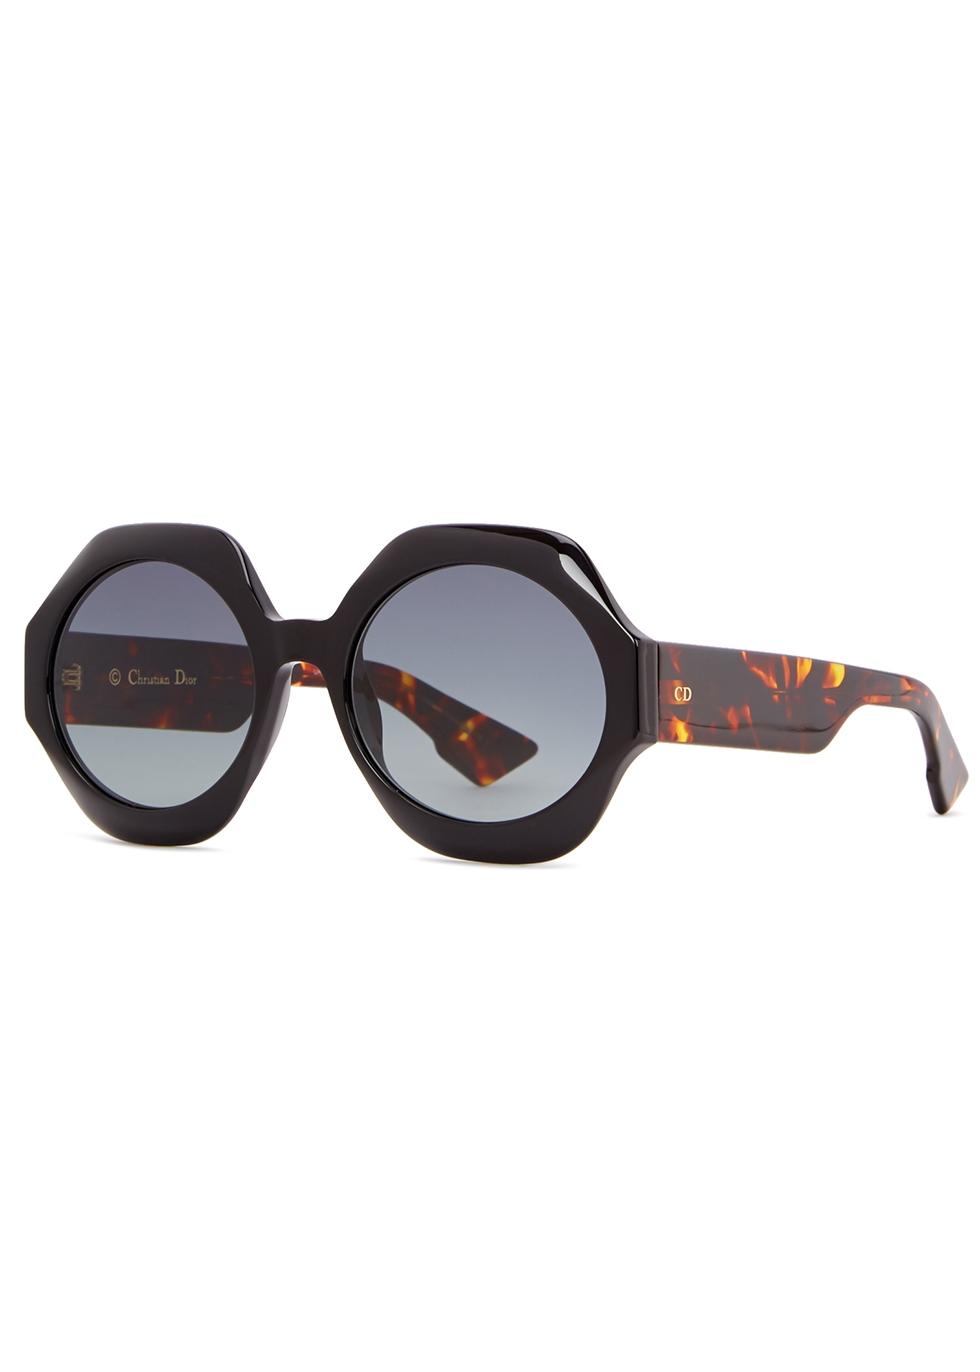 DiorSpirit1 round-frame sunglasses